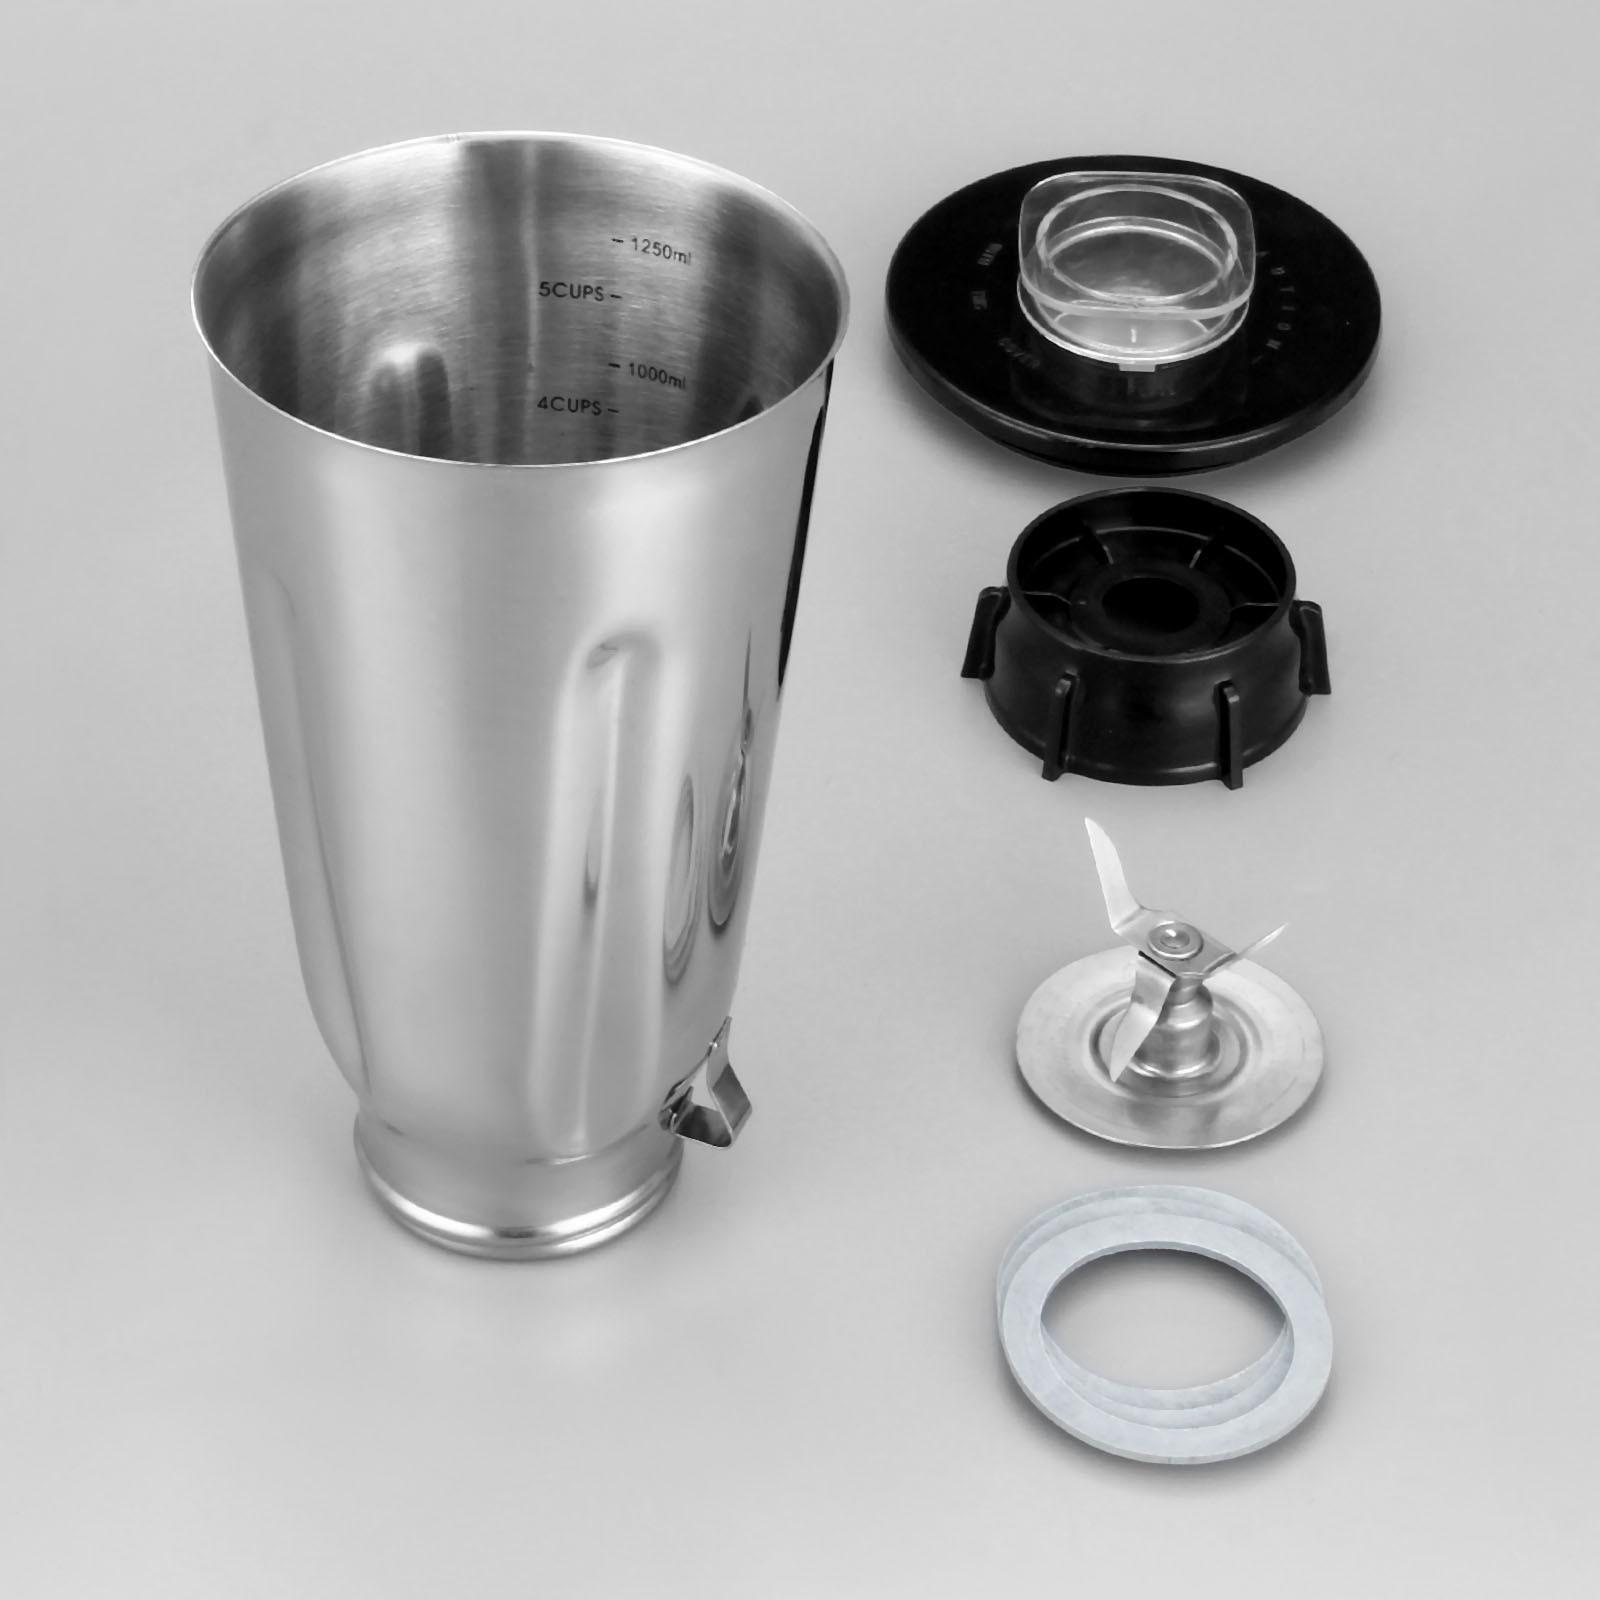 5 Cup Stainless Steel Blender Jar Set Complete 6 Piece SS Set Fits Oster